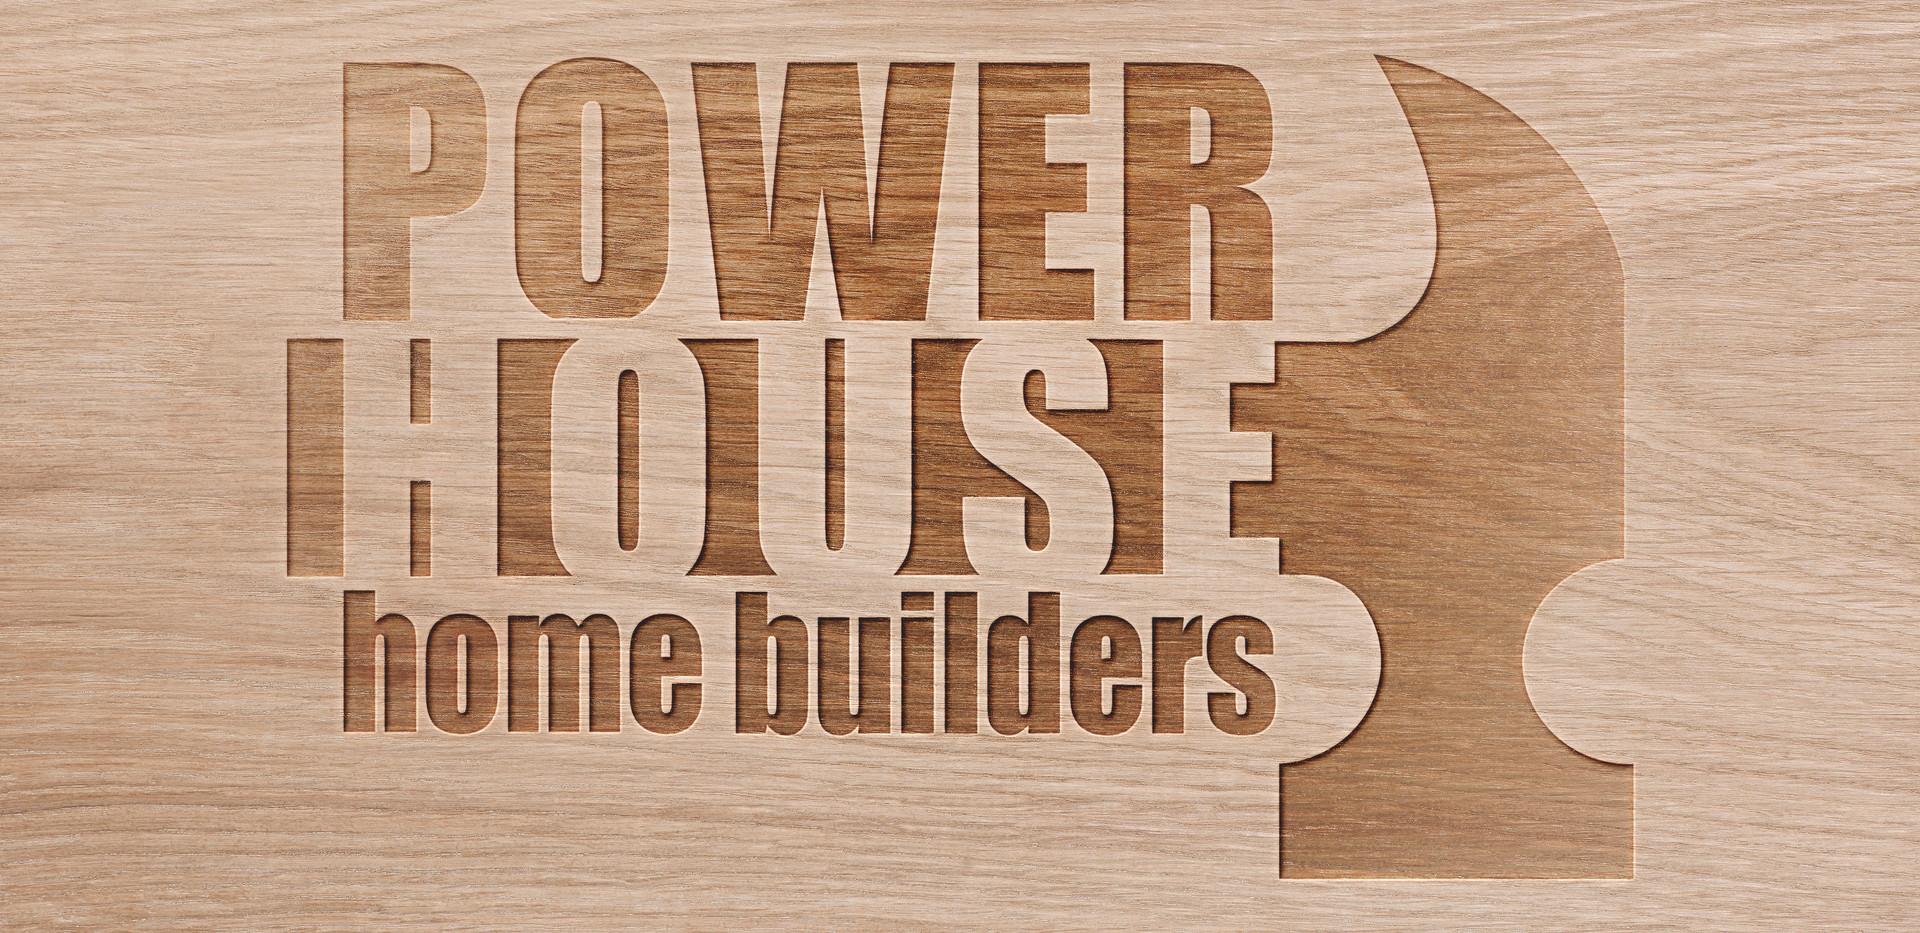 Powerhouse Home Builders Logo